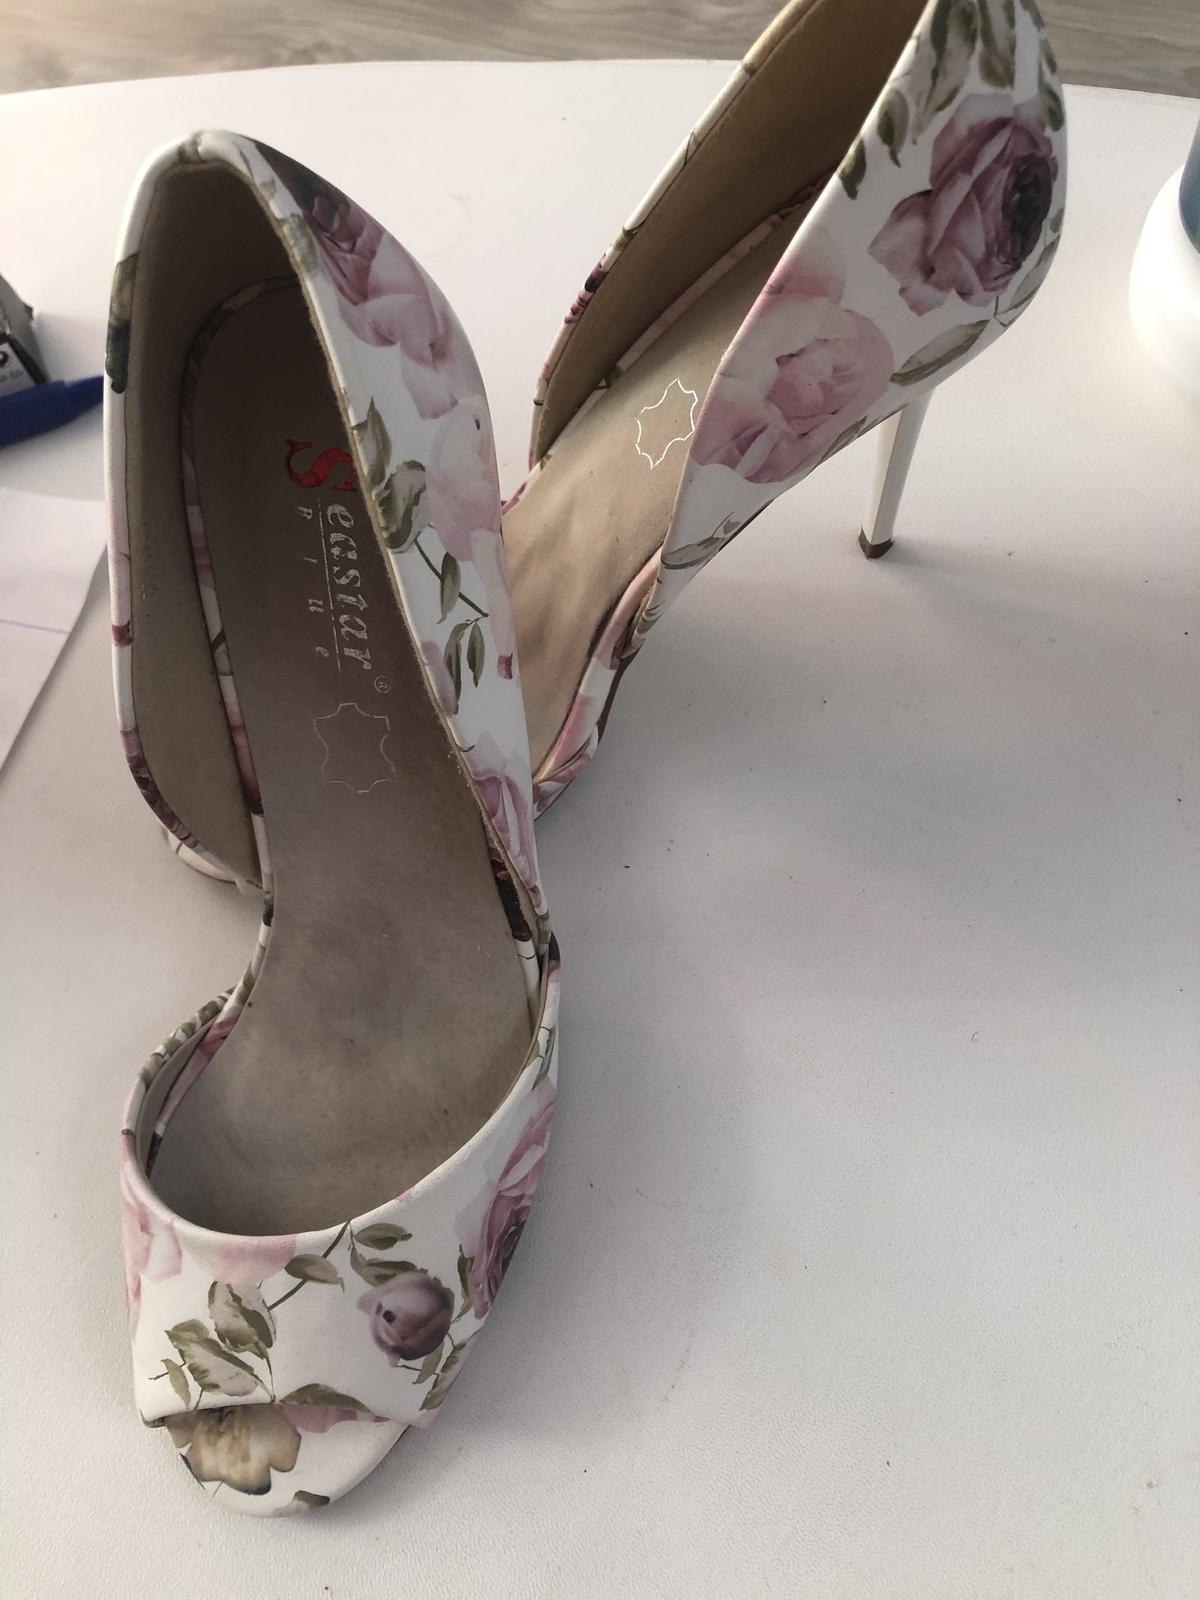 Letné sandálky s kvetmi - Obrázok č. 1